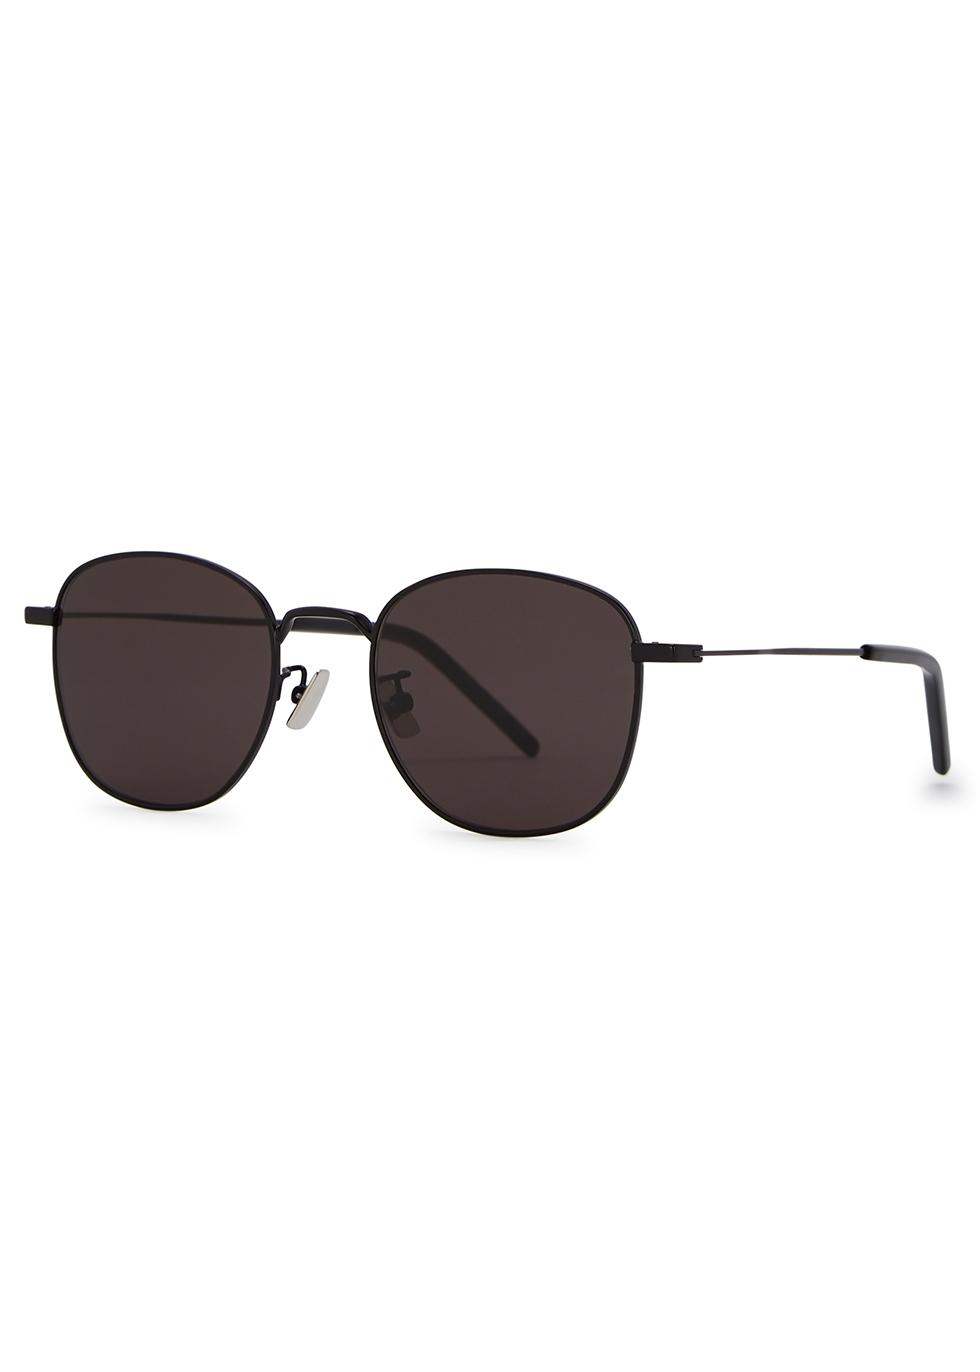 6f975a25100c Women's Designer Sunglasses and Eyewear - Harvey Nichols